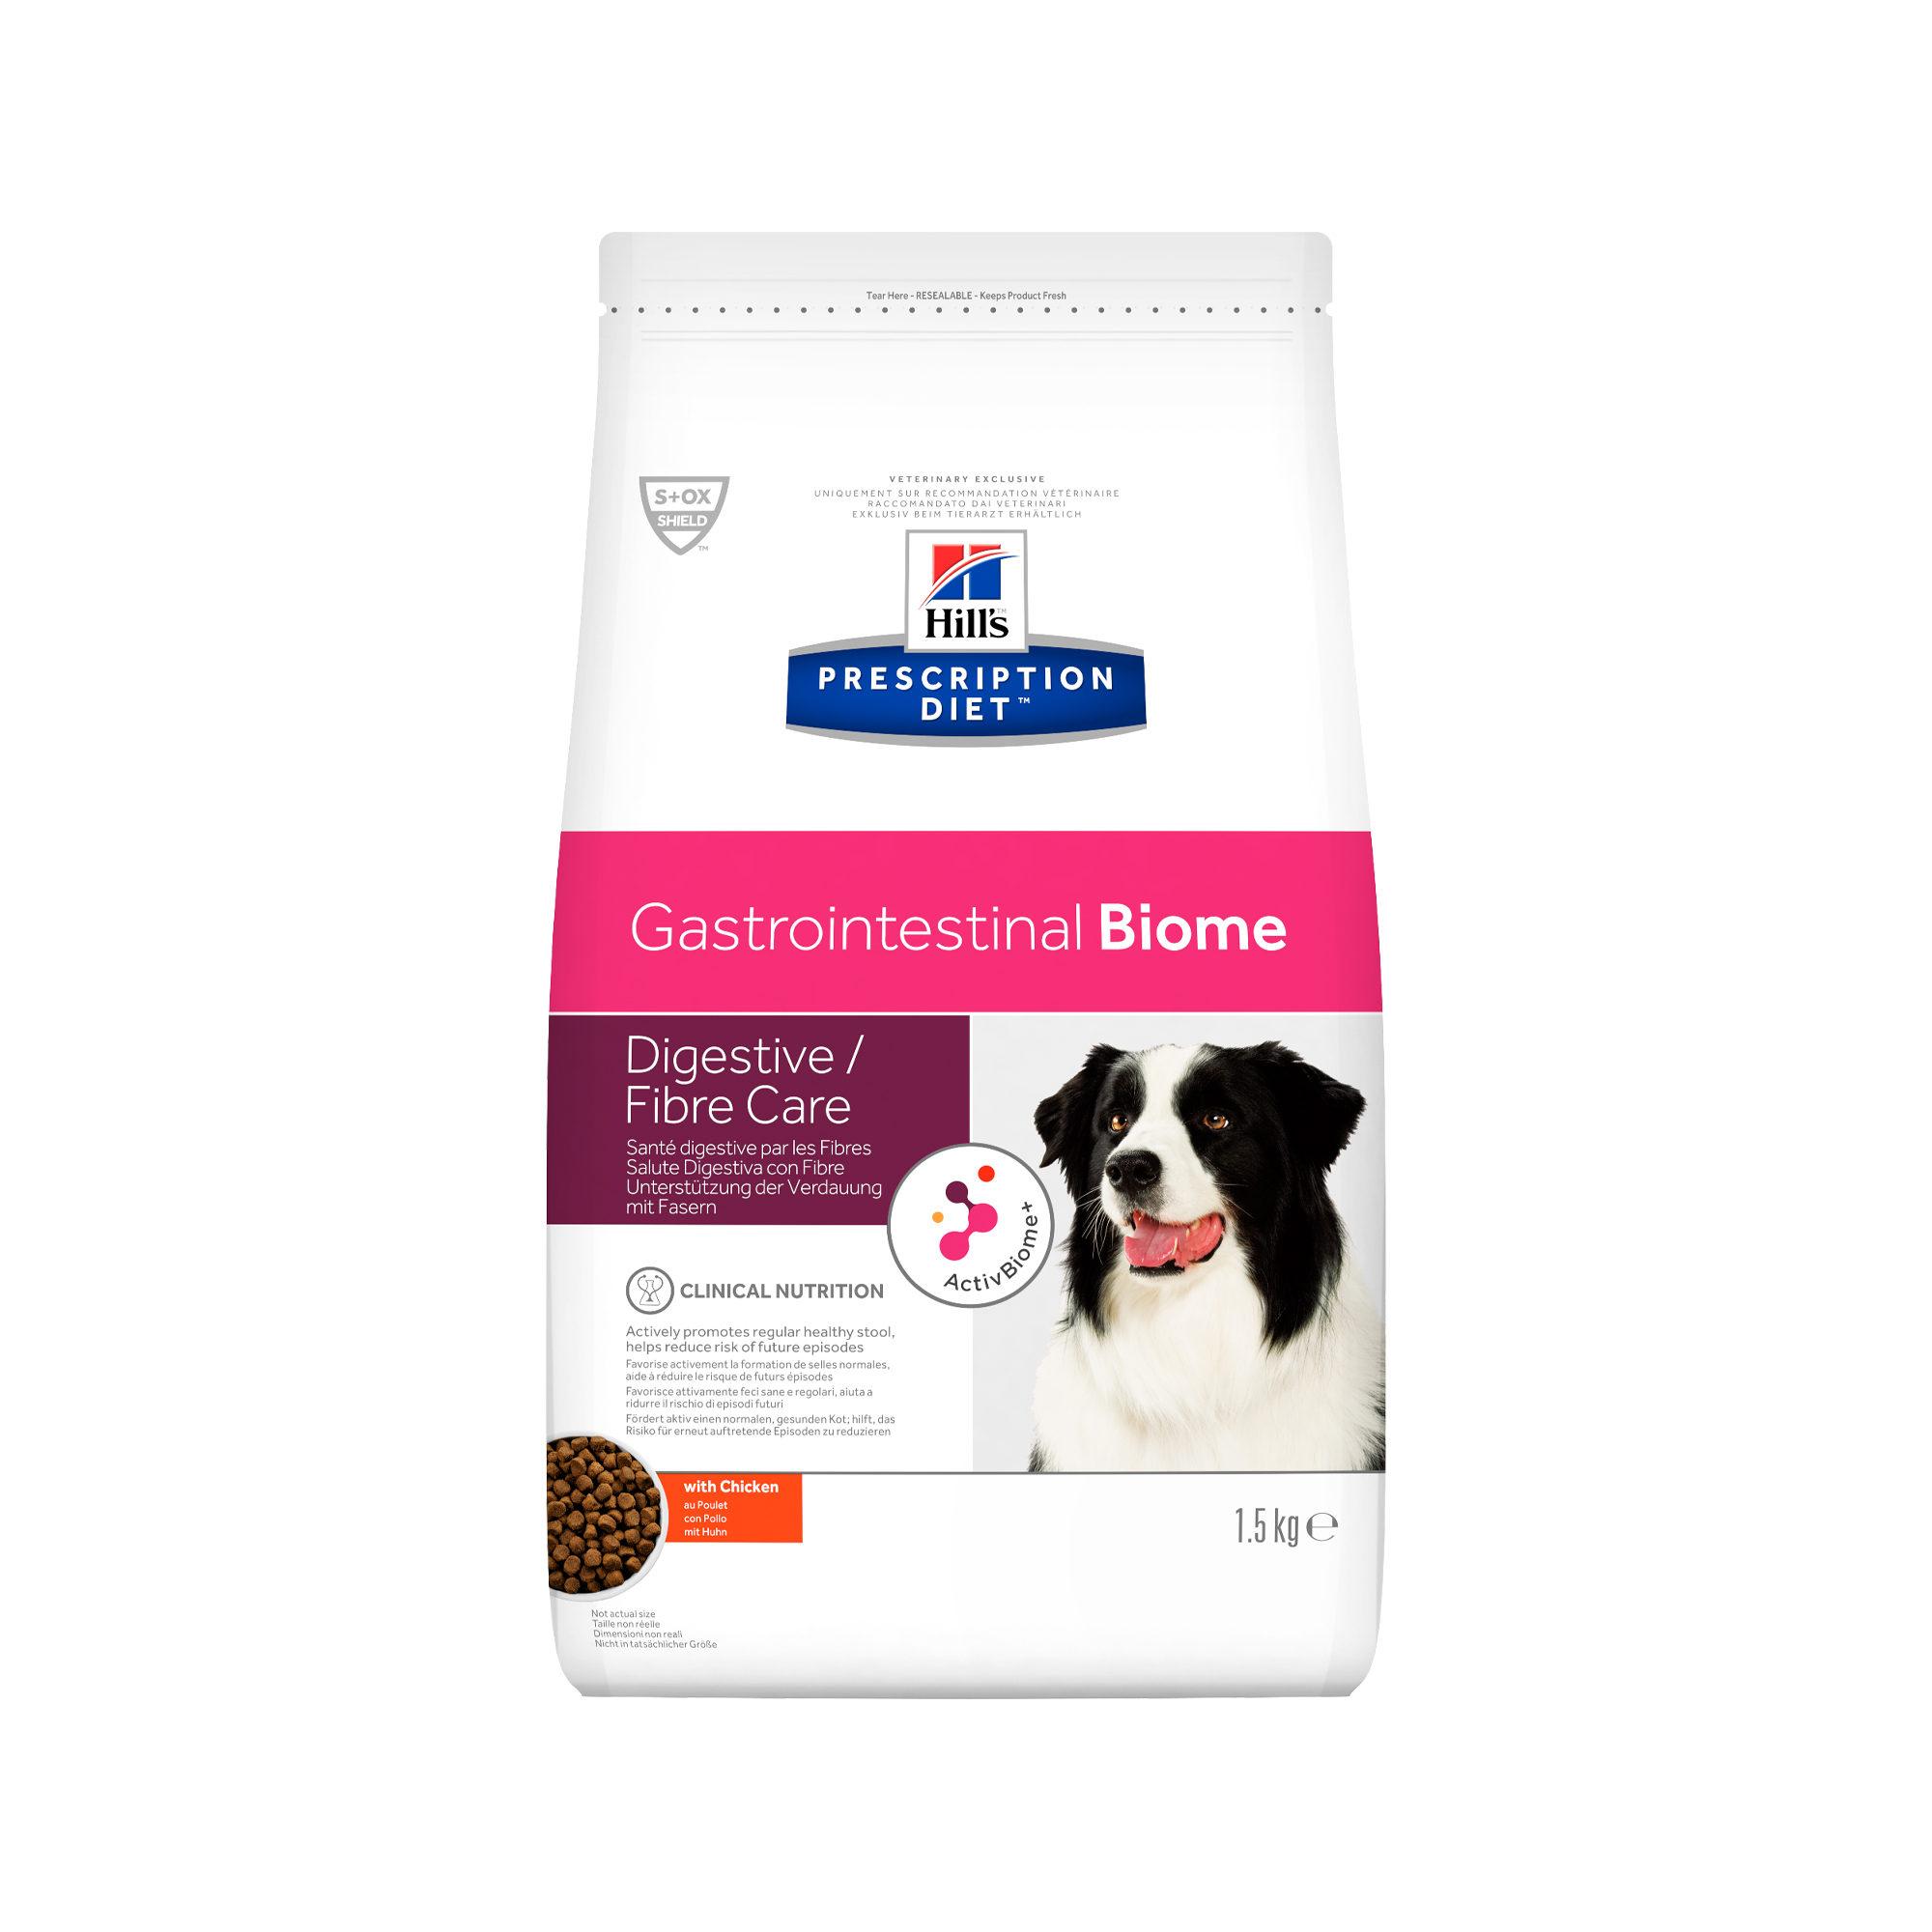 Hill's Prescription Diet Gastrointestinal Biome Hundefutter